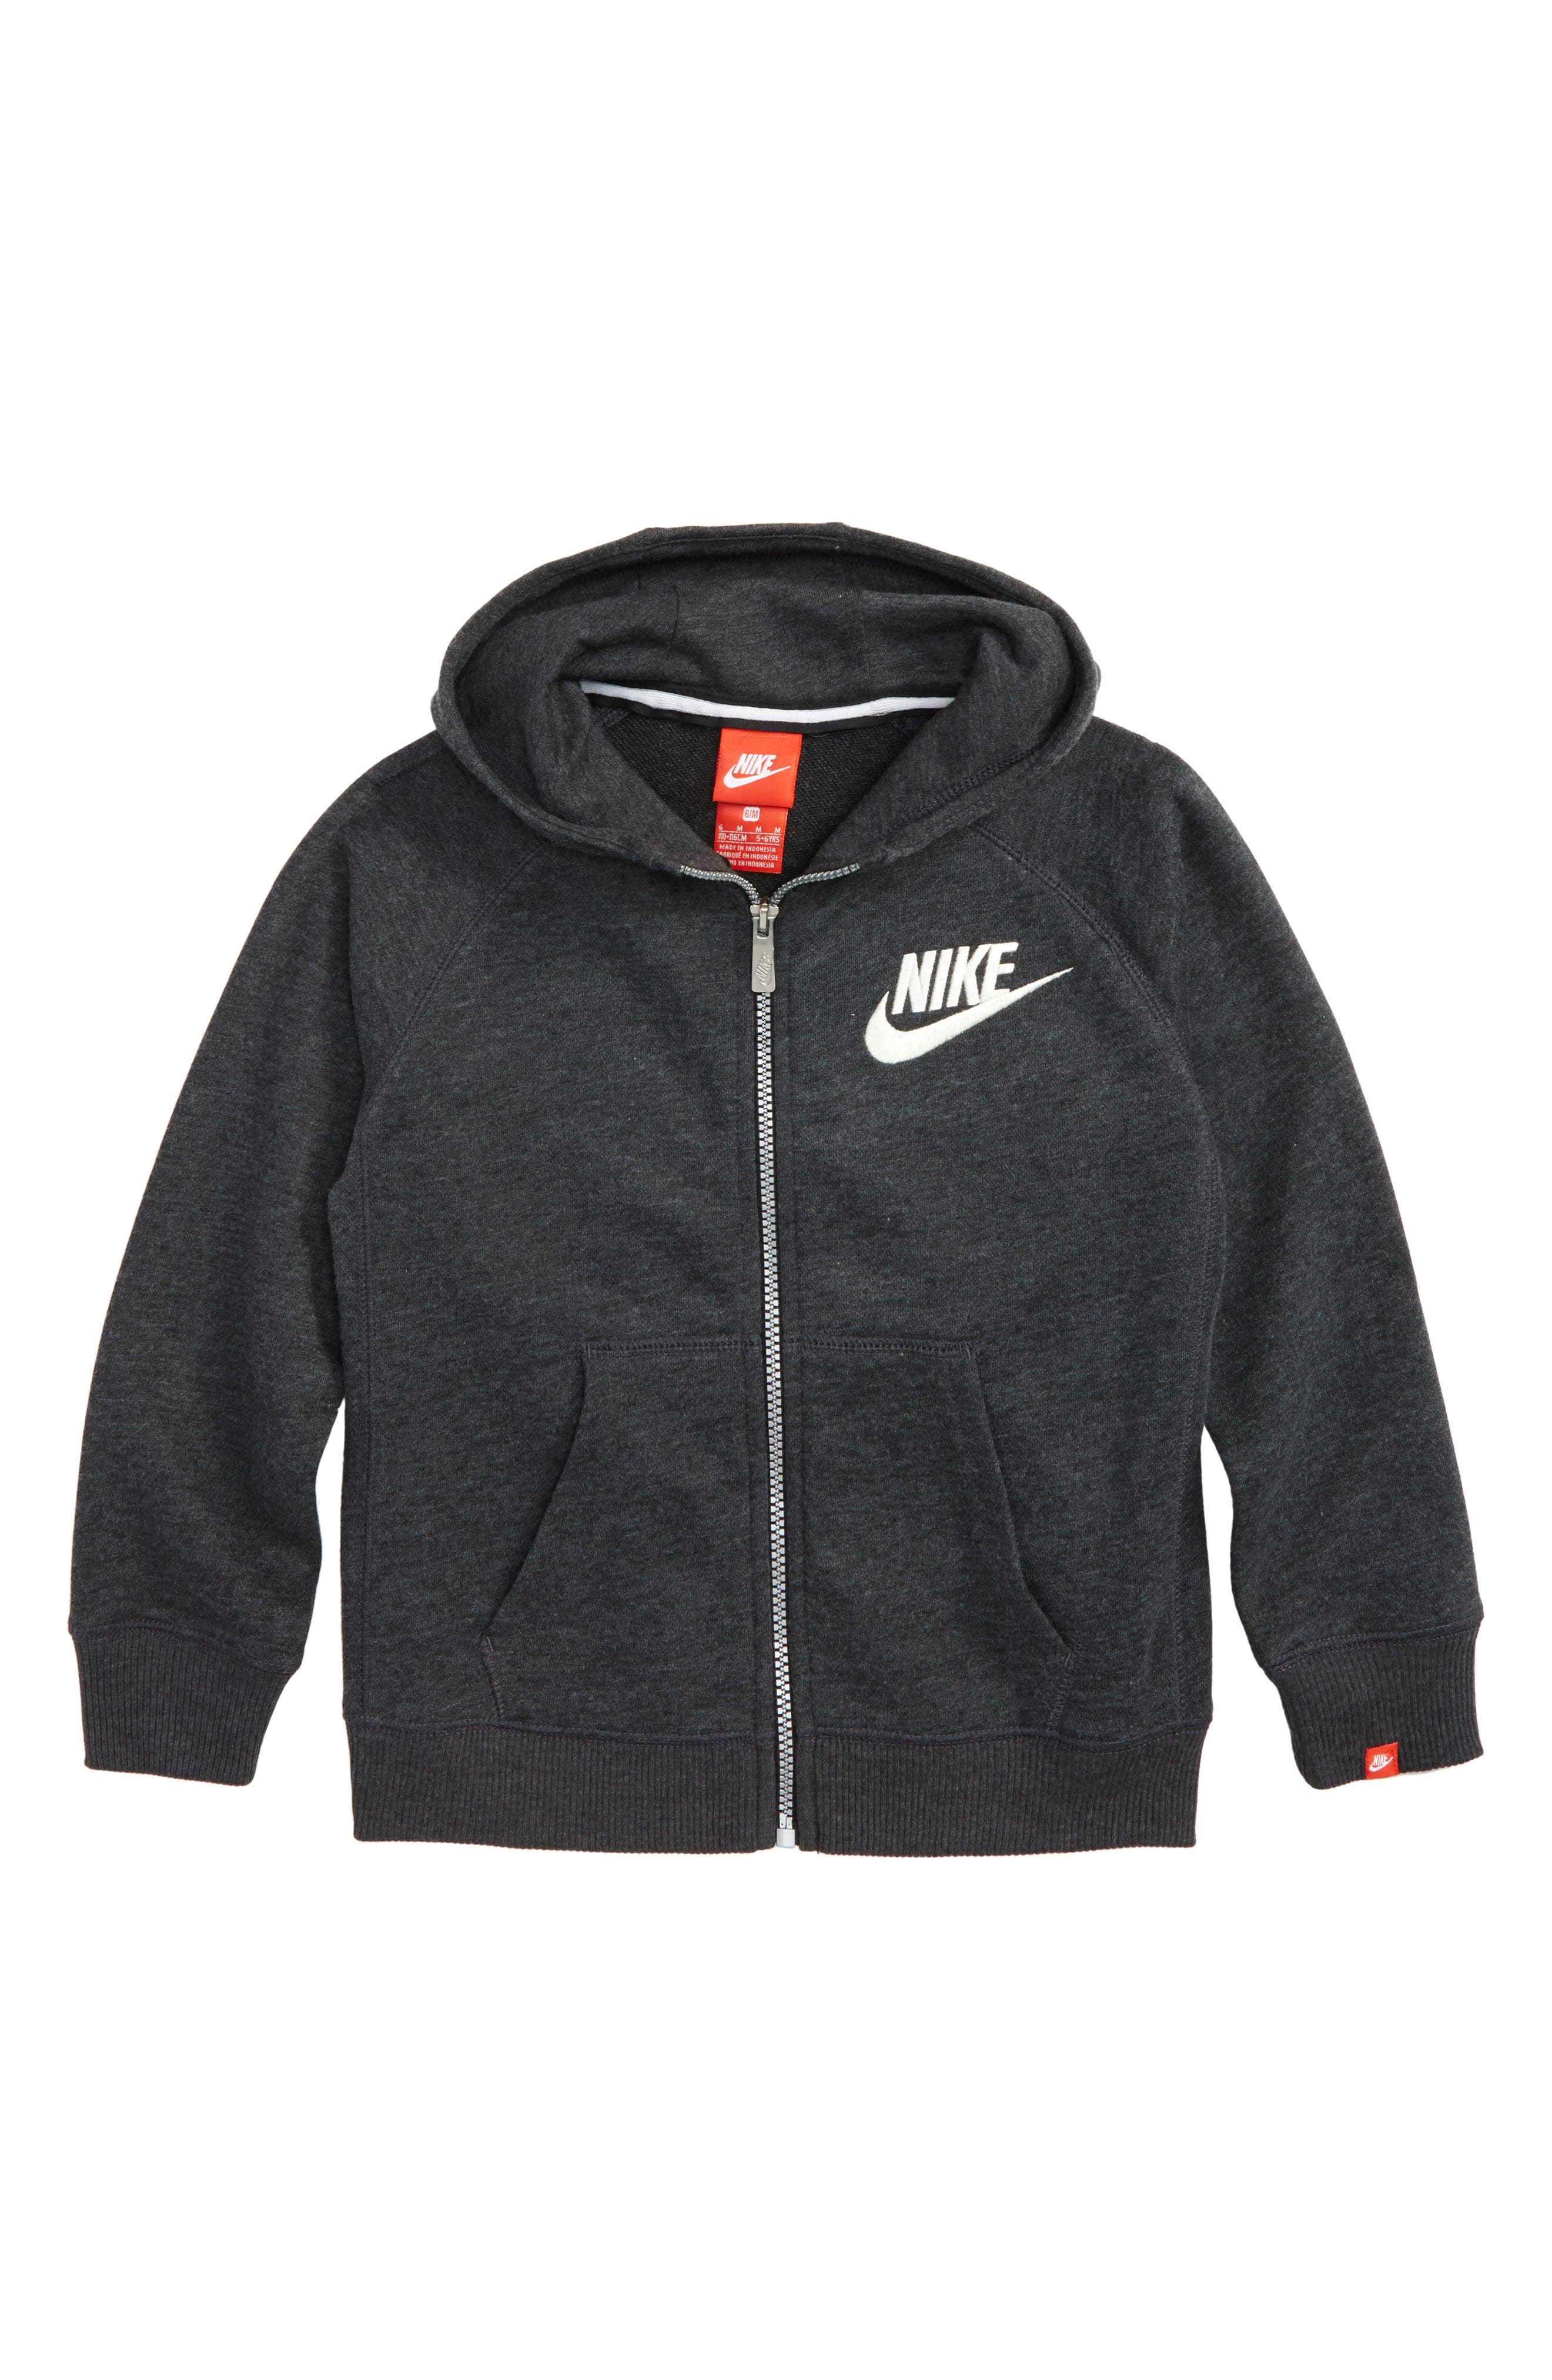 Alternate Image 1 Selected - Nike Legacy Full Zip Hoodie (Toddler Boys & Little Boys)